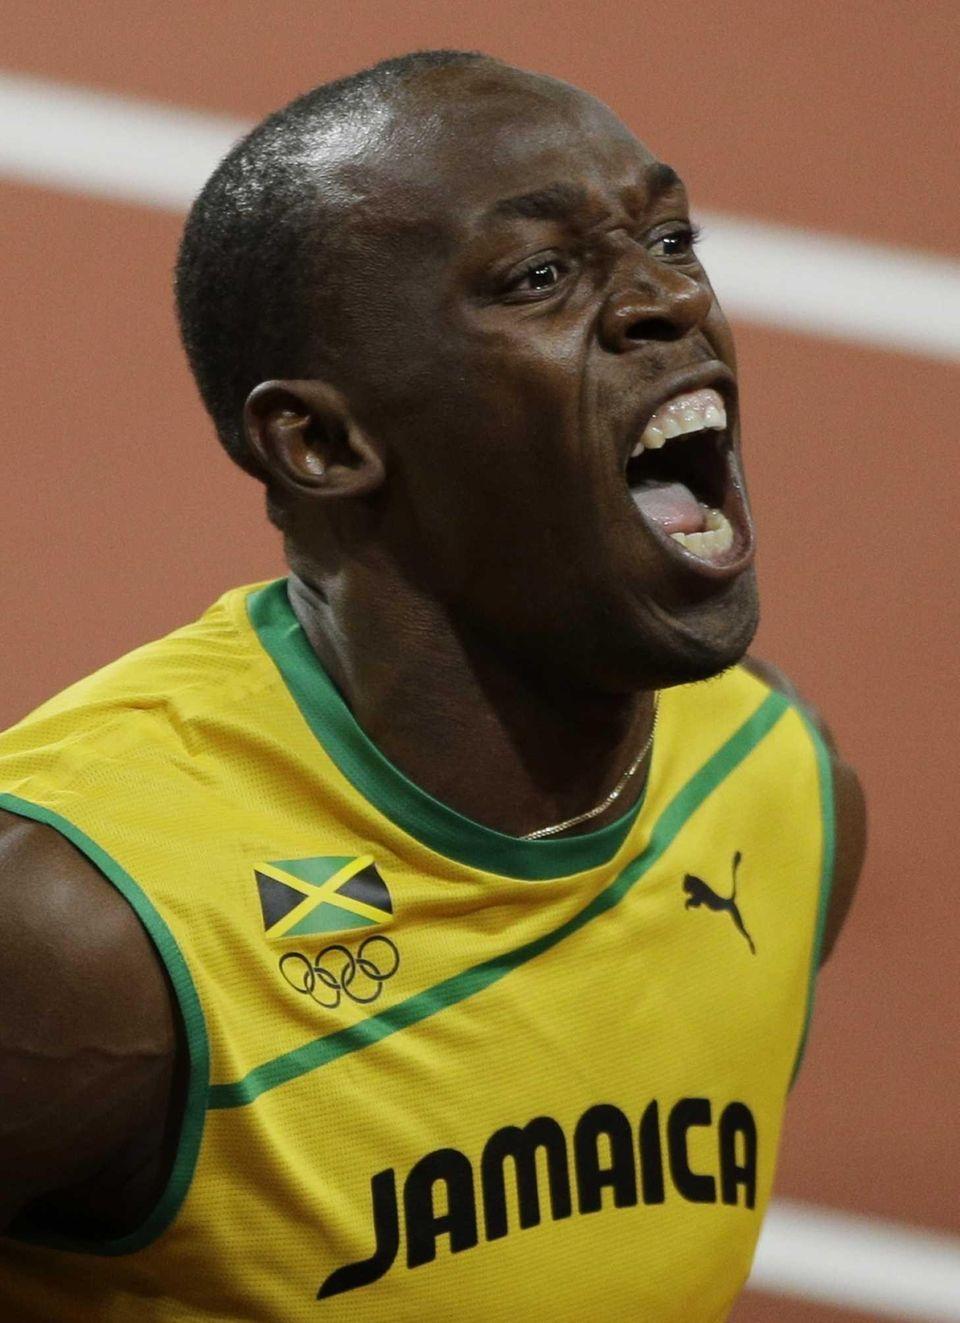 Jamaica's Usain Bolt yells after winning the men's